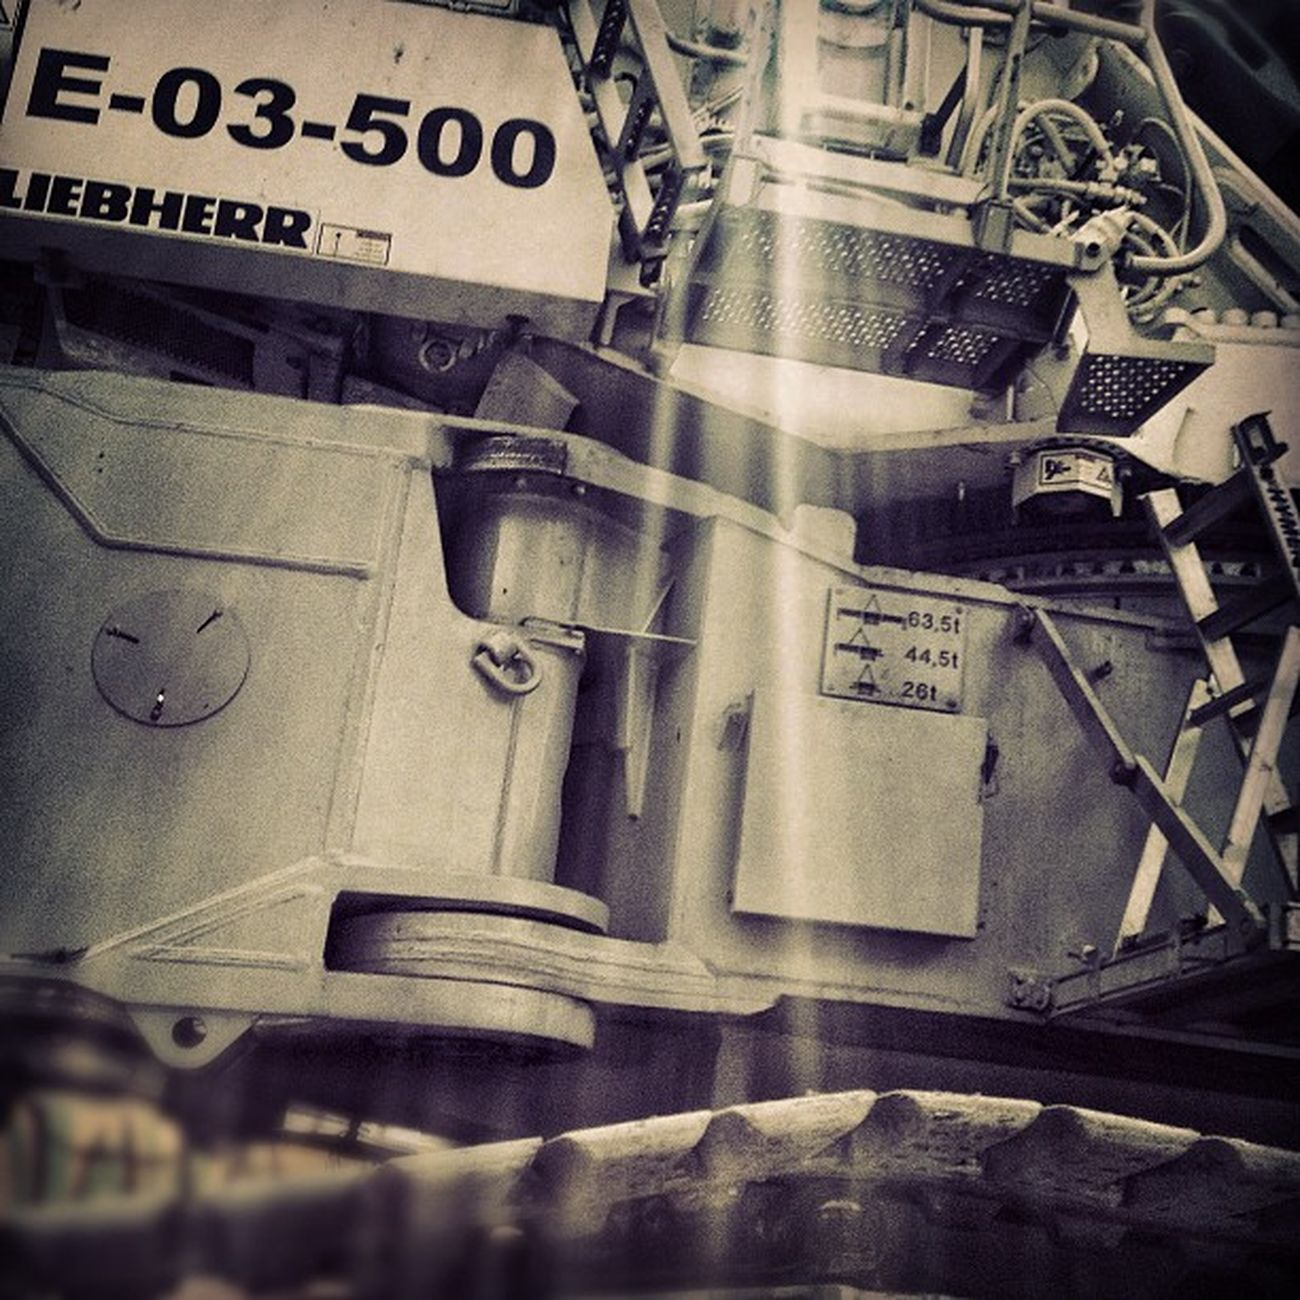 E03500 Naveespacial Machine Construction starwars liebherr igers instagramers ihub instamood instagood instahub picoftheday photooftheday fotodeldia bestpicoftheday gramermex mextagram iphoneonly iphonesia iphone4s igersmania mexico lalojm1 2012